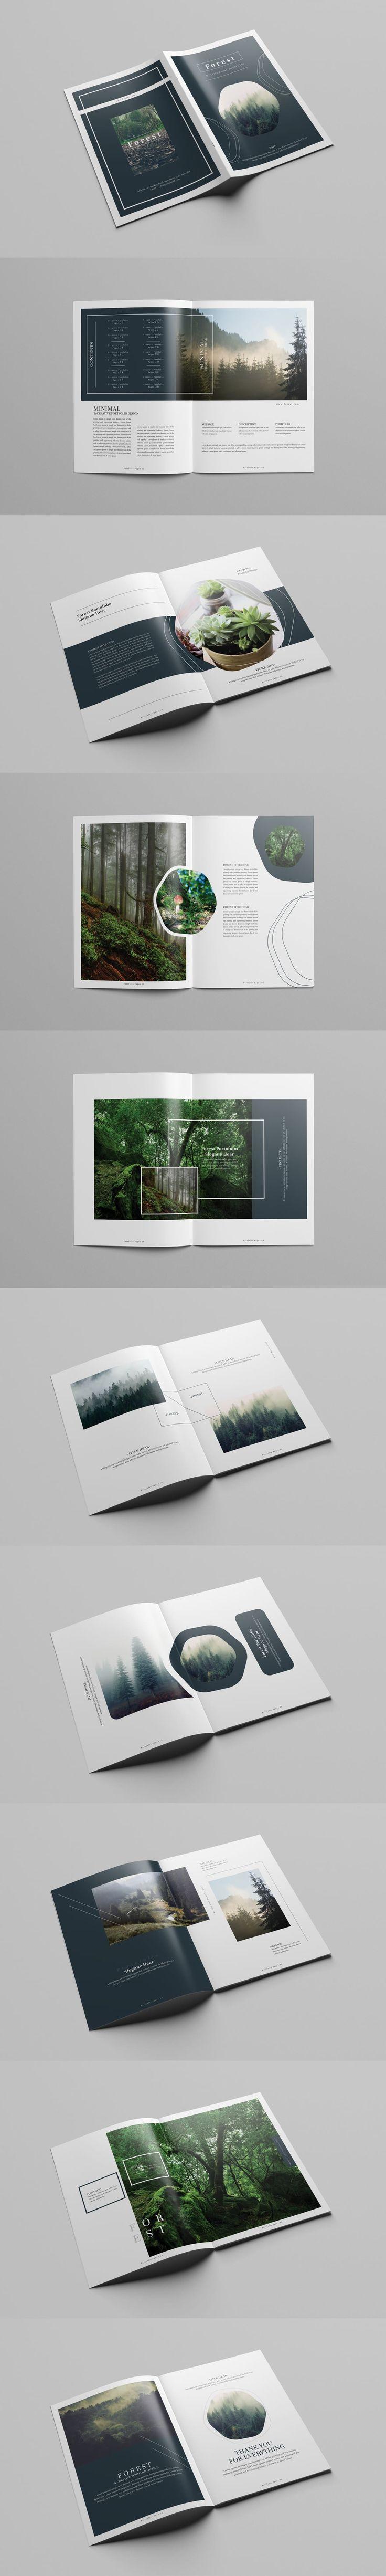 Multipurpose Creative Portfolio Brochure Template InDesign INDD - 36 Custom Pages, US Letter Size